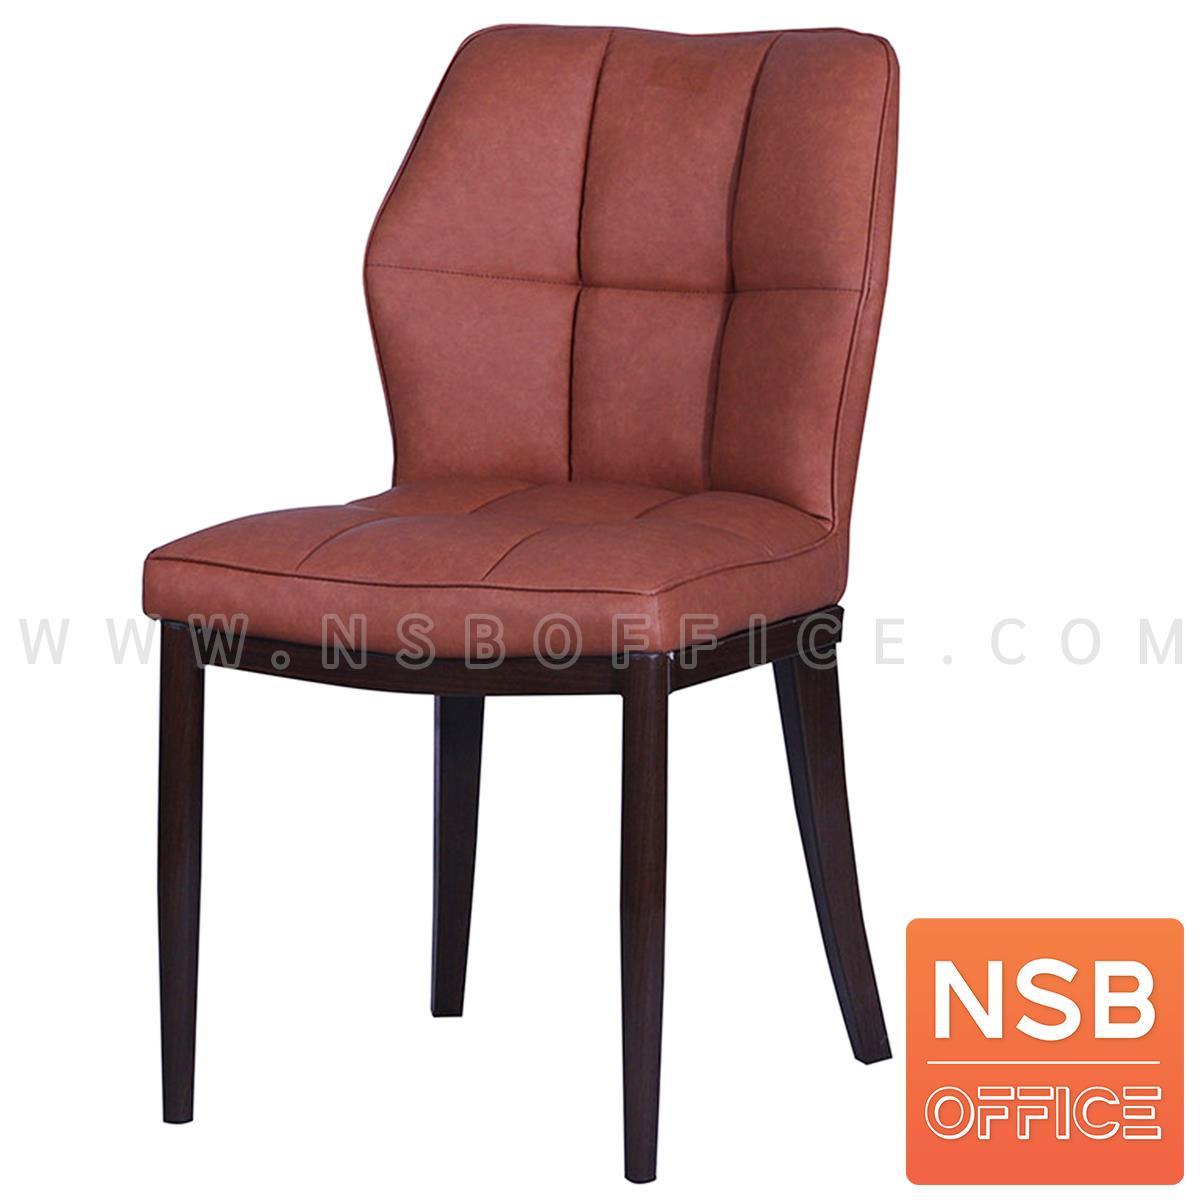 B29A381:เก้าอี้โมเดิร์นหุ้มหนัง รุ่น Redspin (เรดสปิน)  ขาเหล็ก